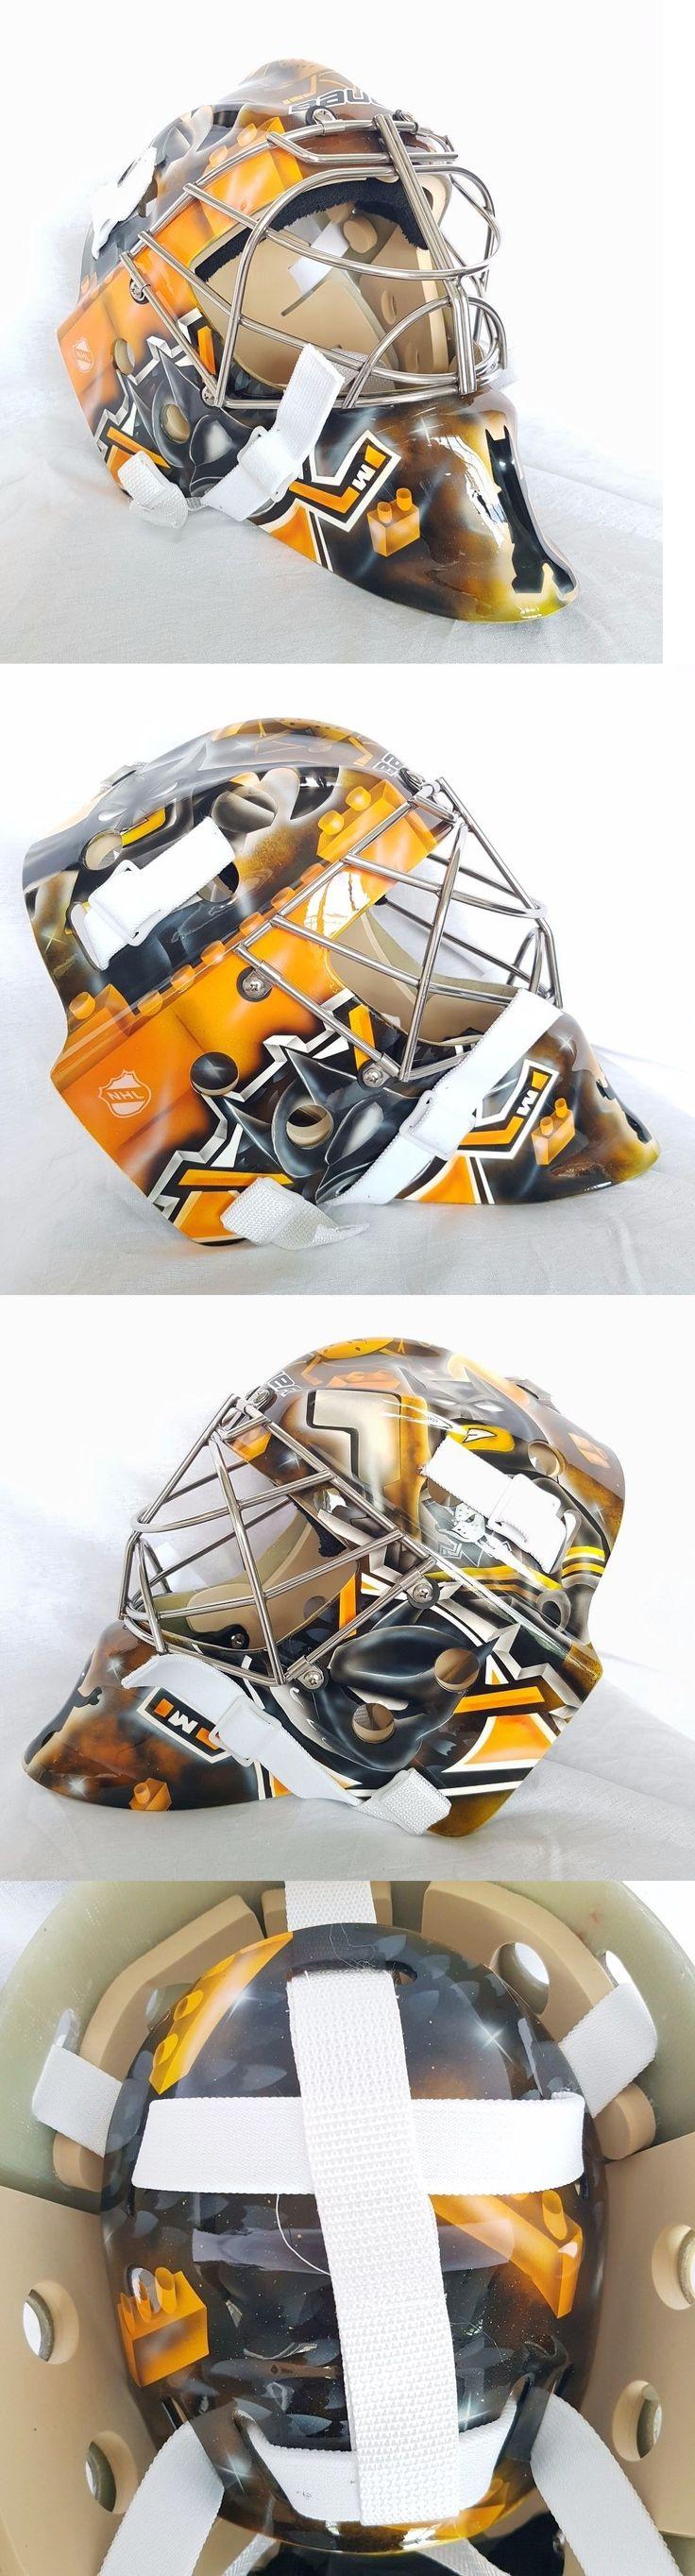 Face Masks 79762: Ducks Anaheim Lego Batman Goalie Mask Hockey Helmet Nhl Full Size Adult -> BUY IT NOW ONLY: $999.99 on eBay!